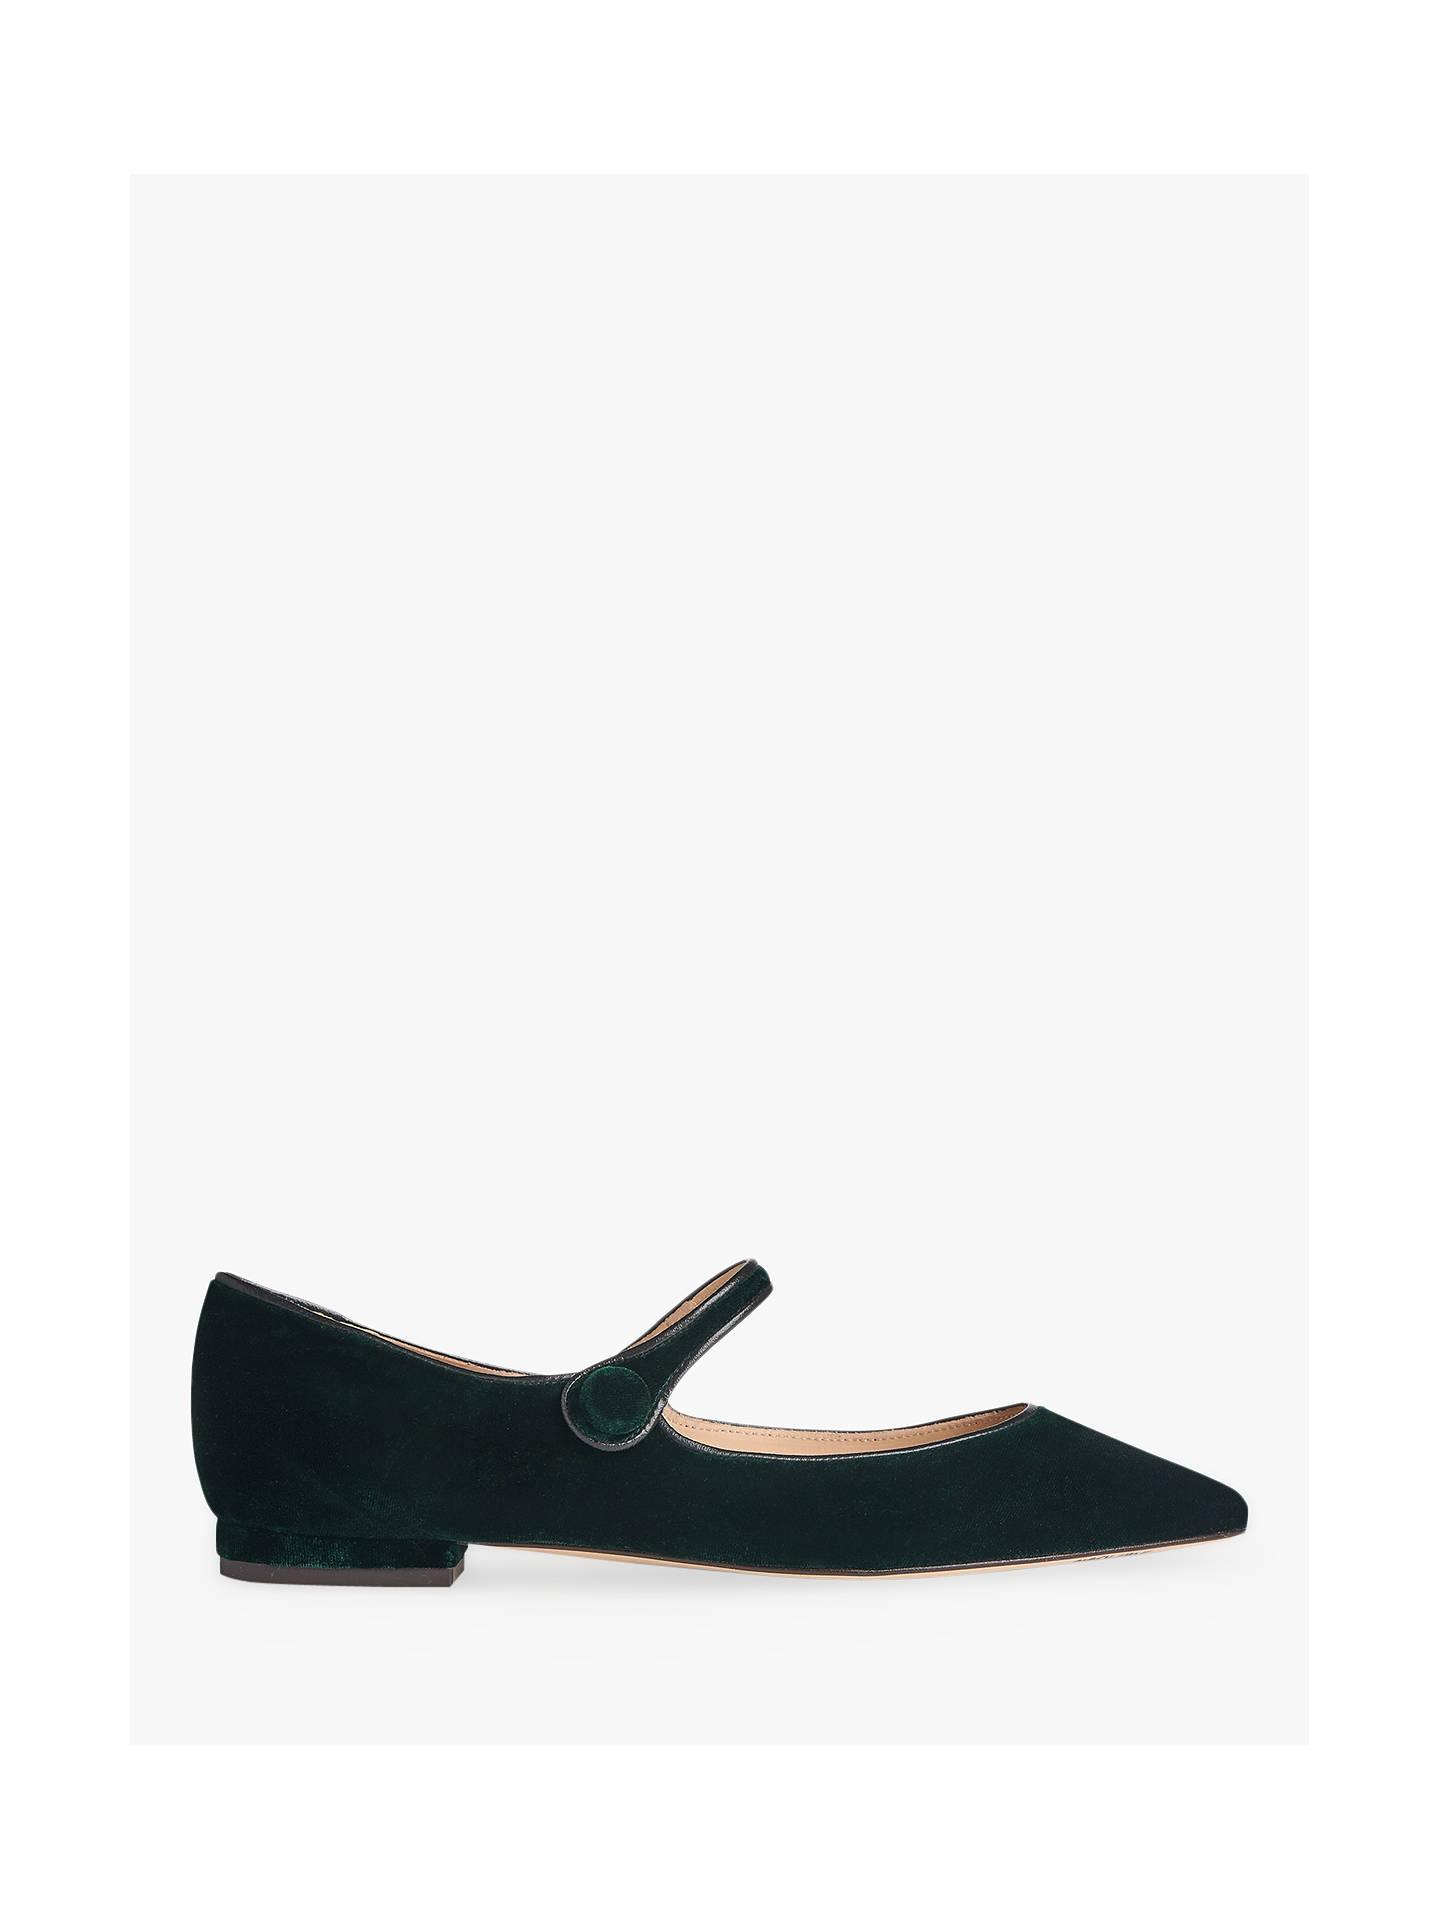 Buy L.K.Bennett Mary-Jane Flat Shoes